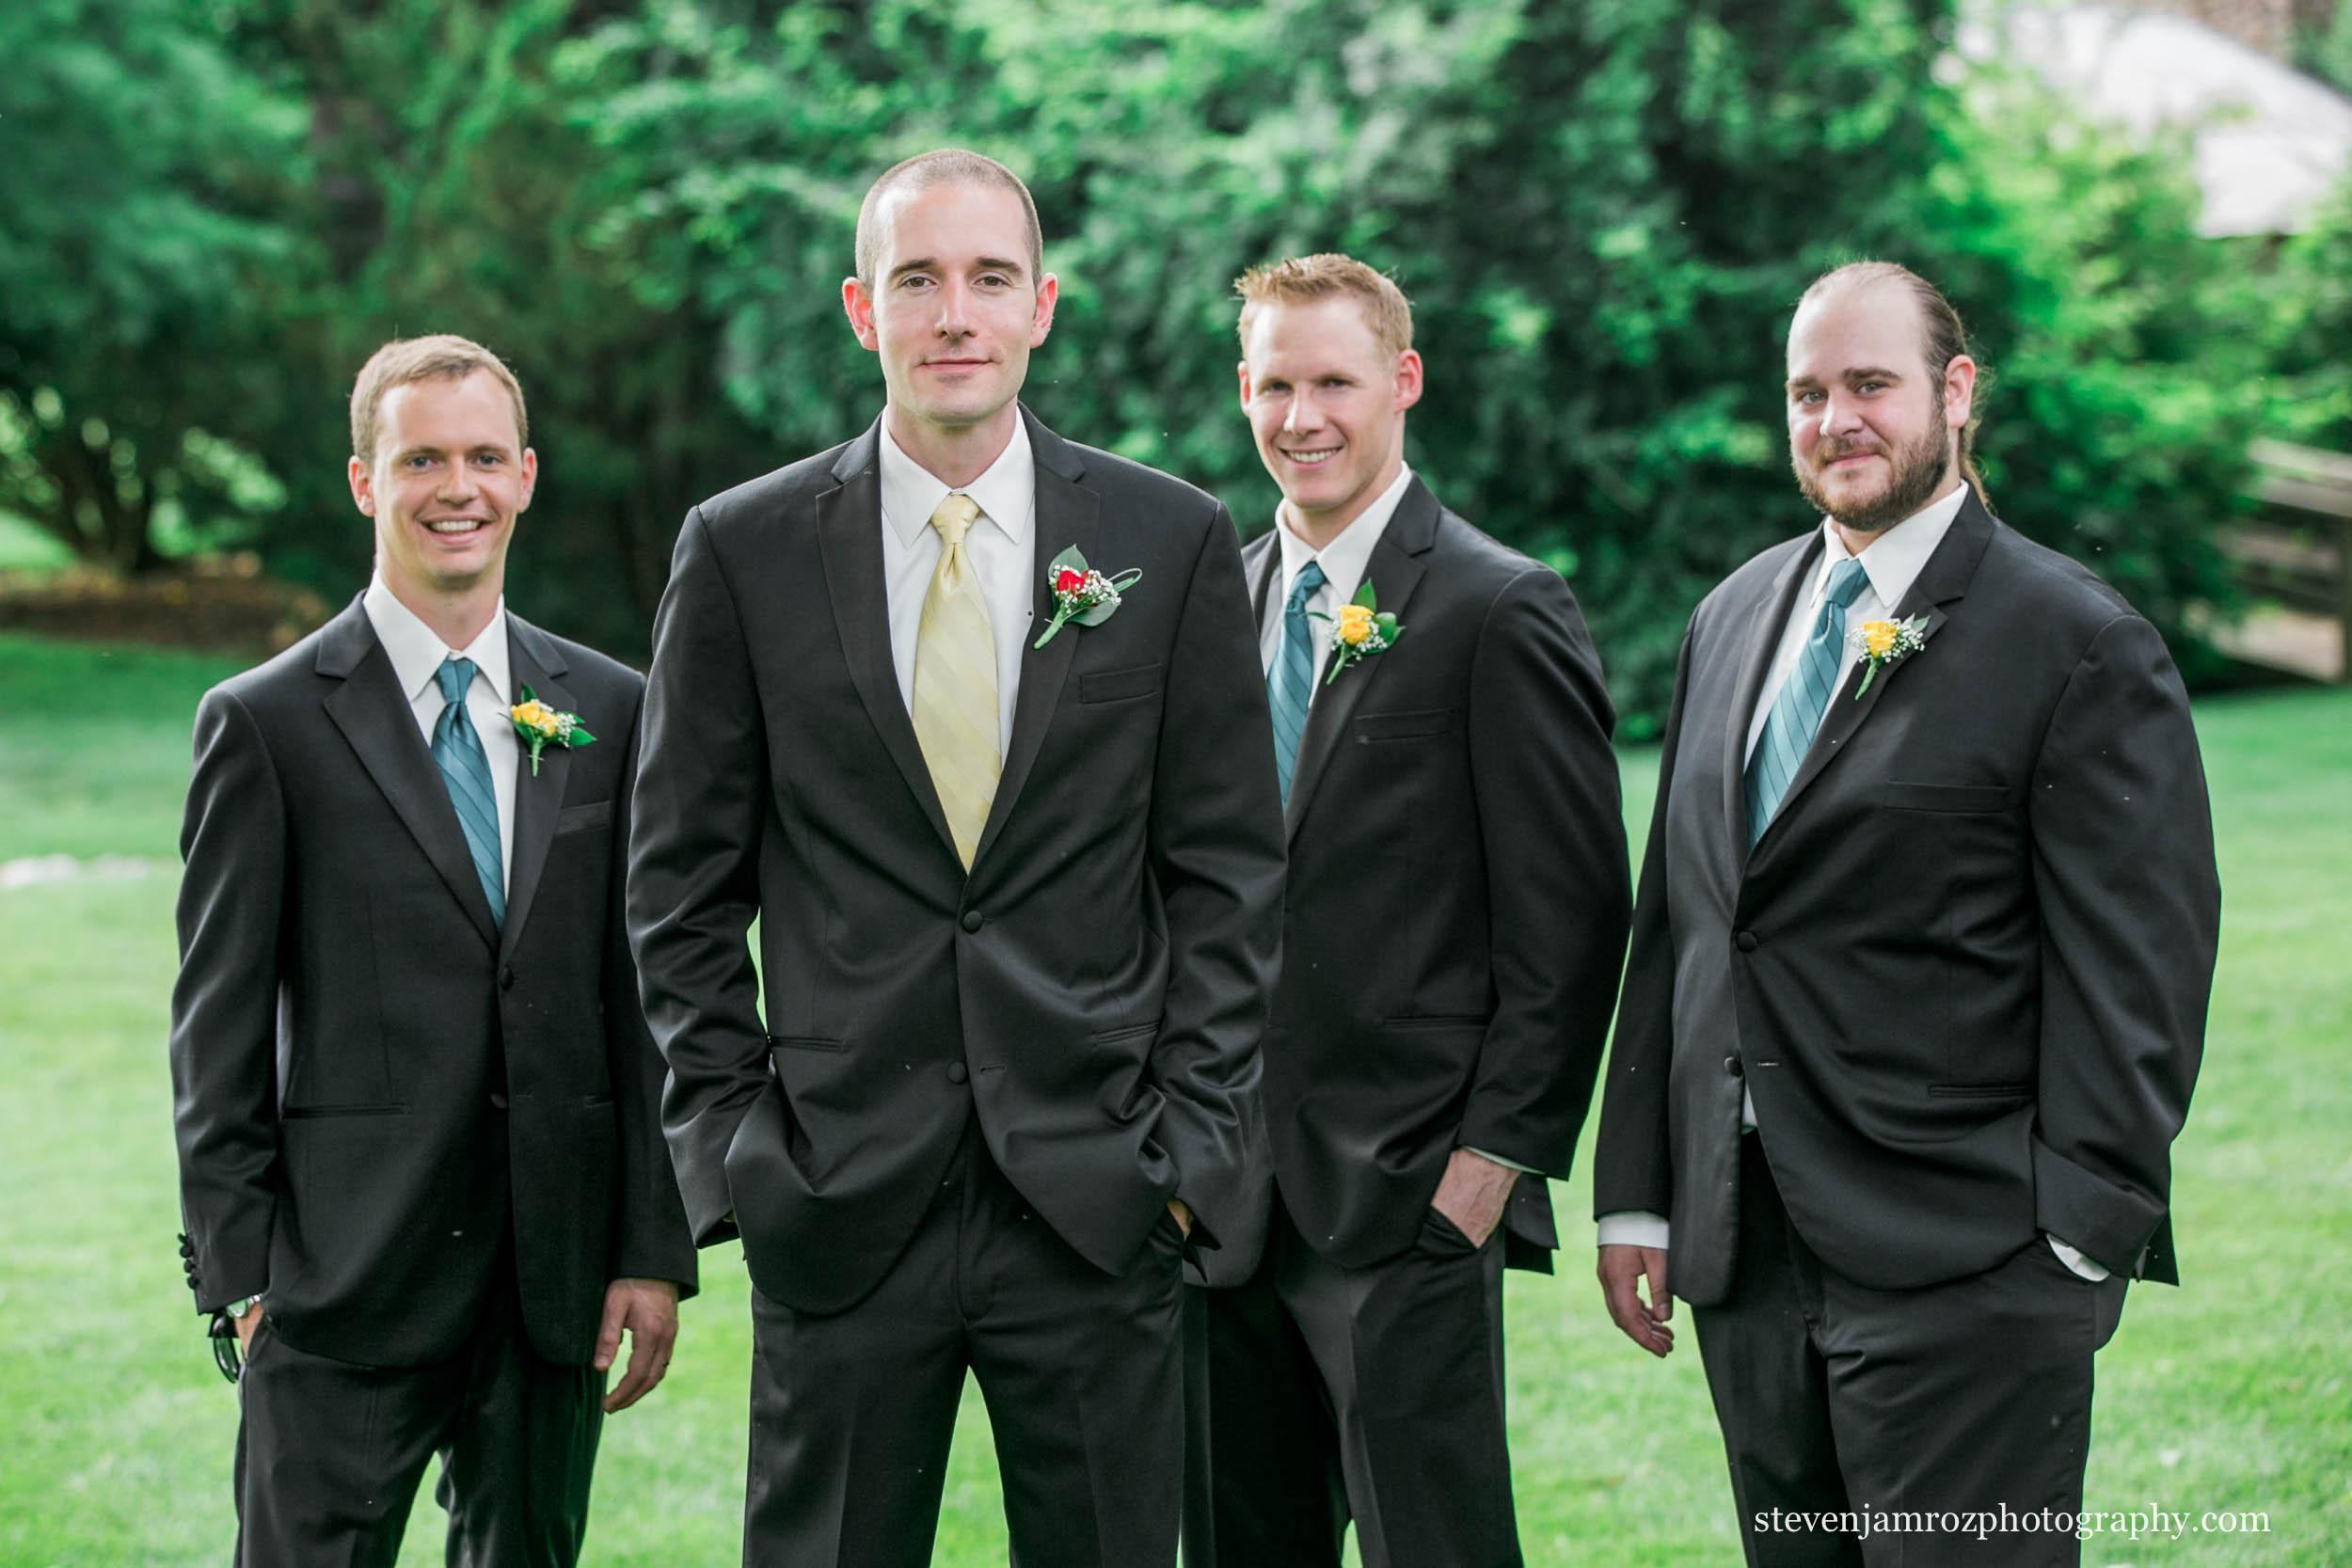 groomsmen-photo-rosehill-plantation-steven-jamroz-photography-0434.jpg